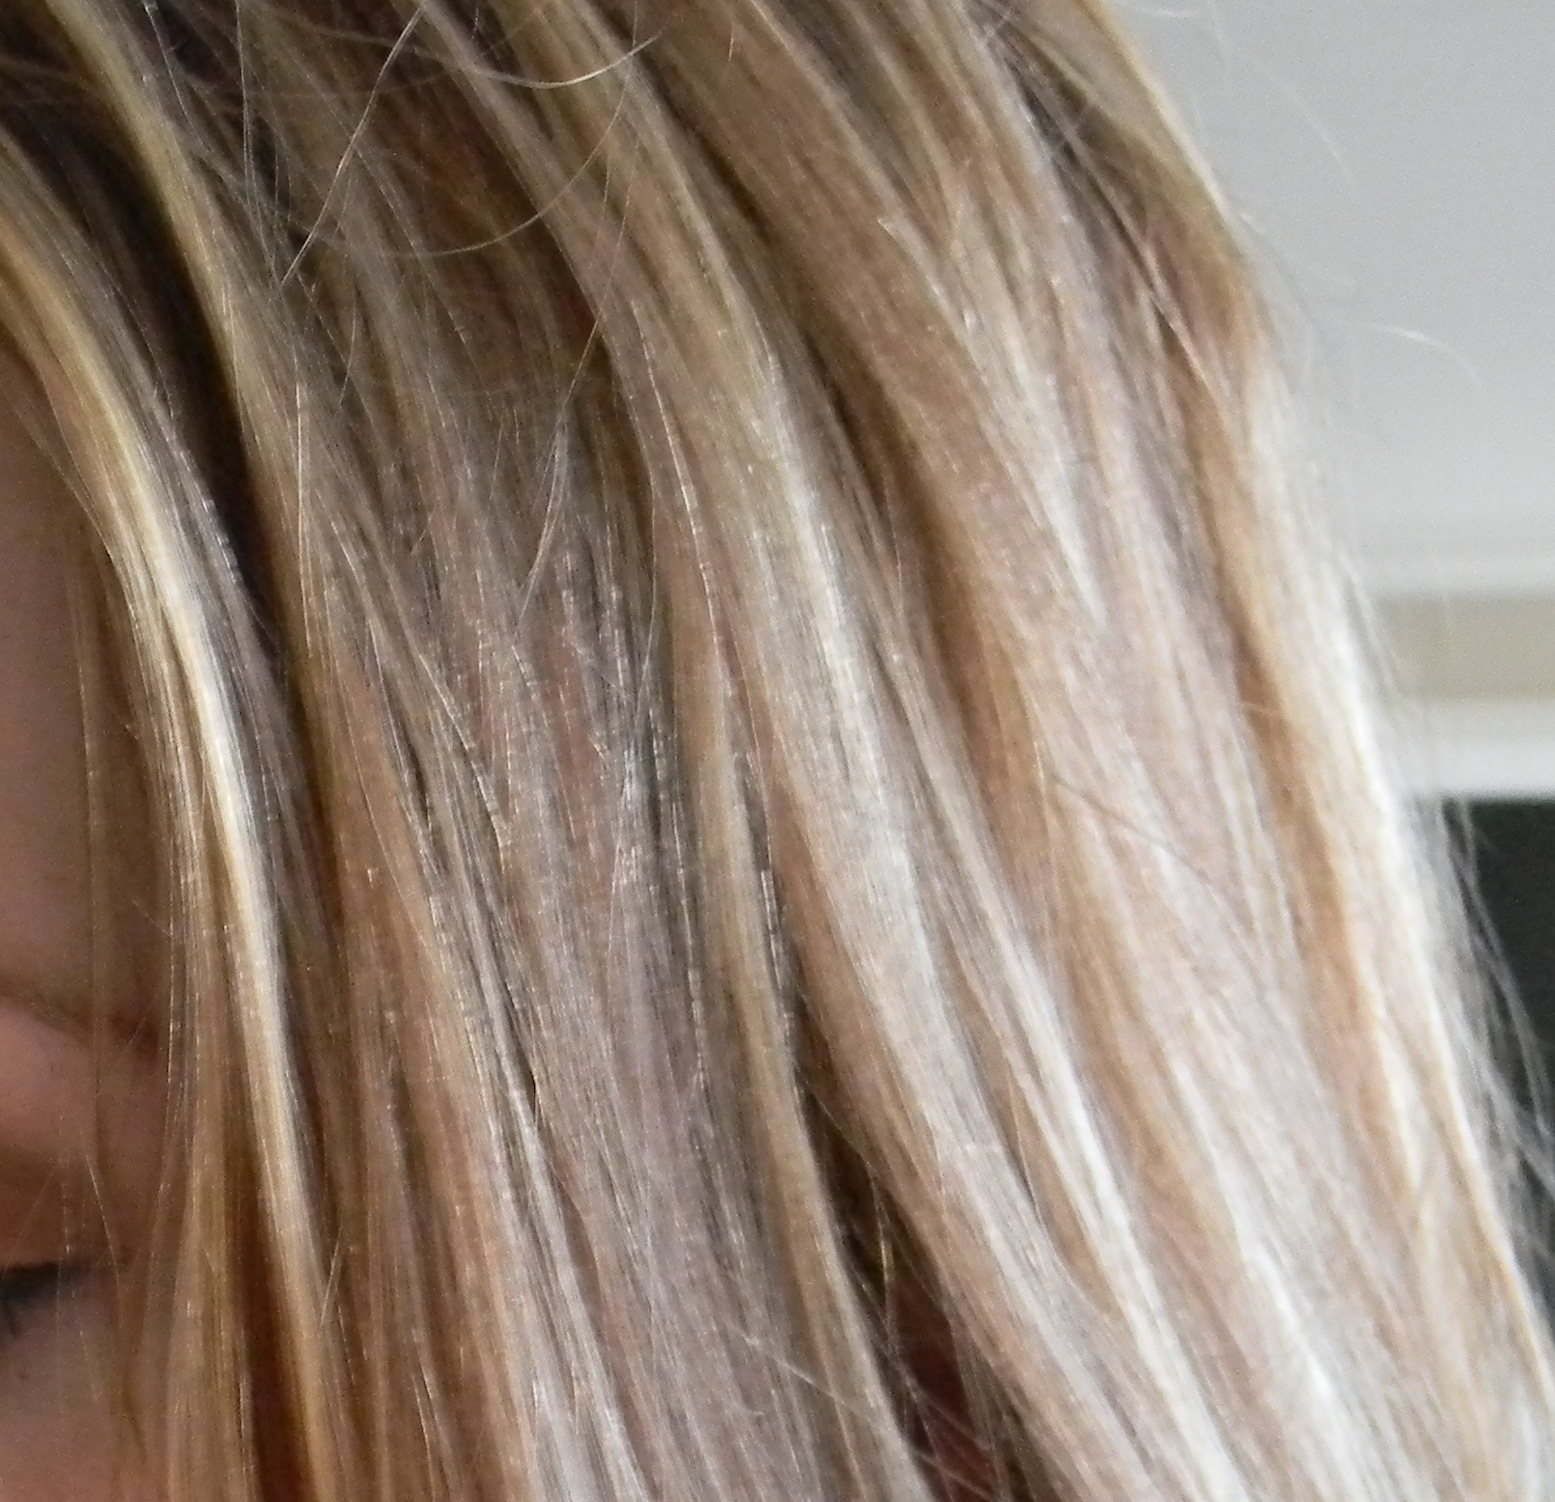 John Frieda Go Blonder Shampoo And Conditioner On Brown